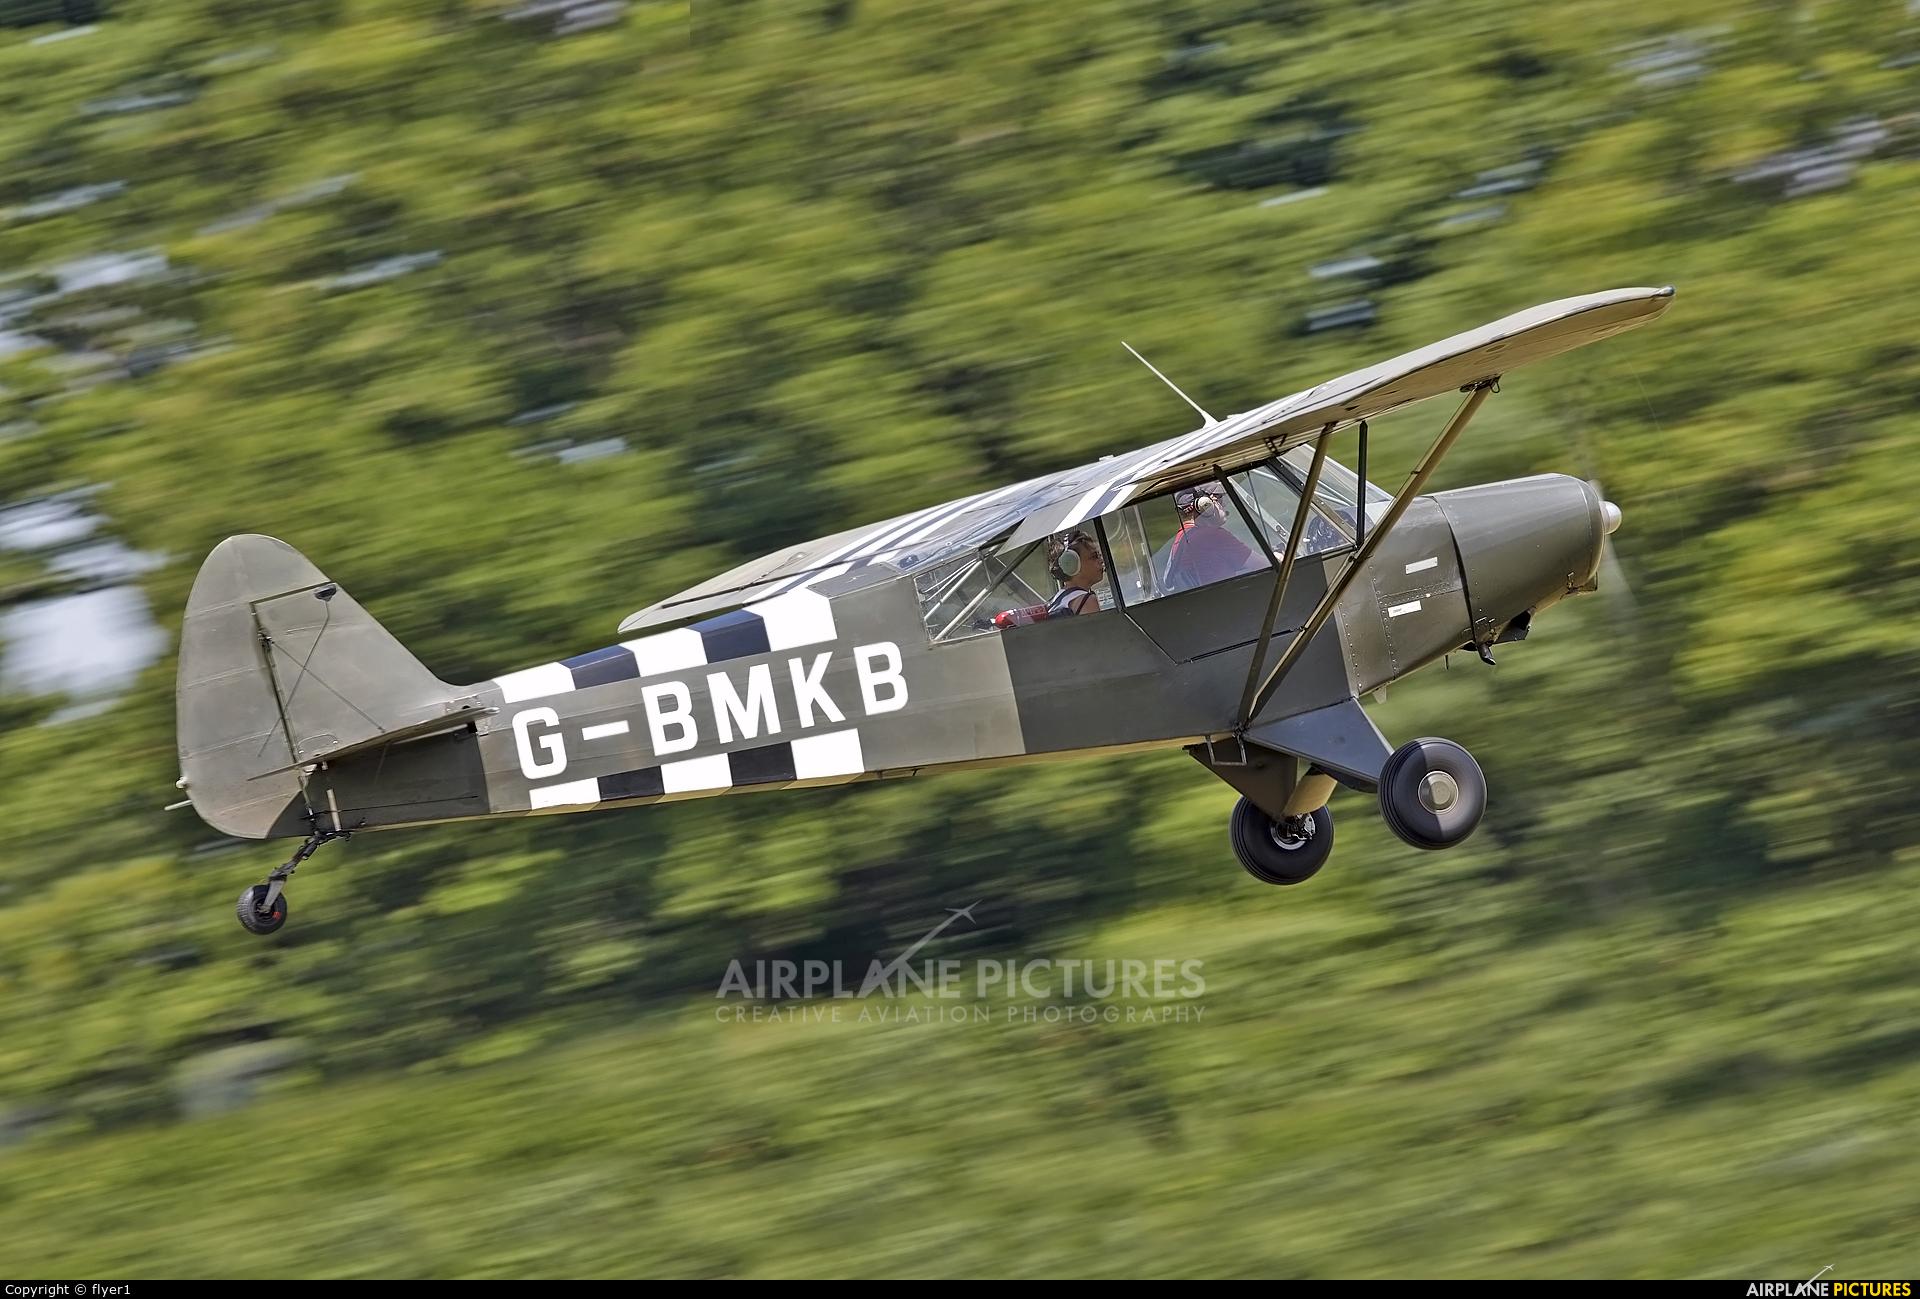 Private G-BMKB aircraft at Lashenden / Headcorn